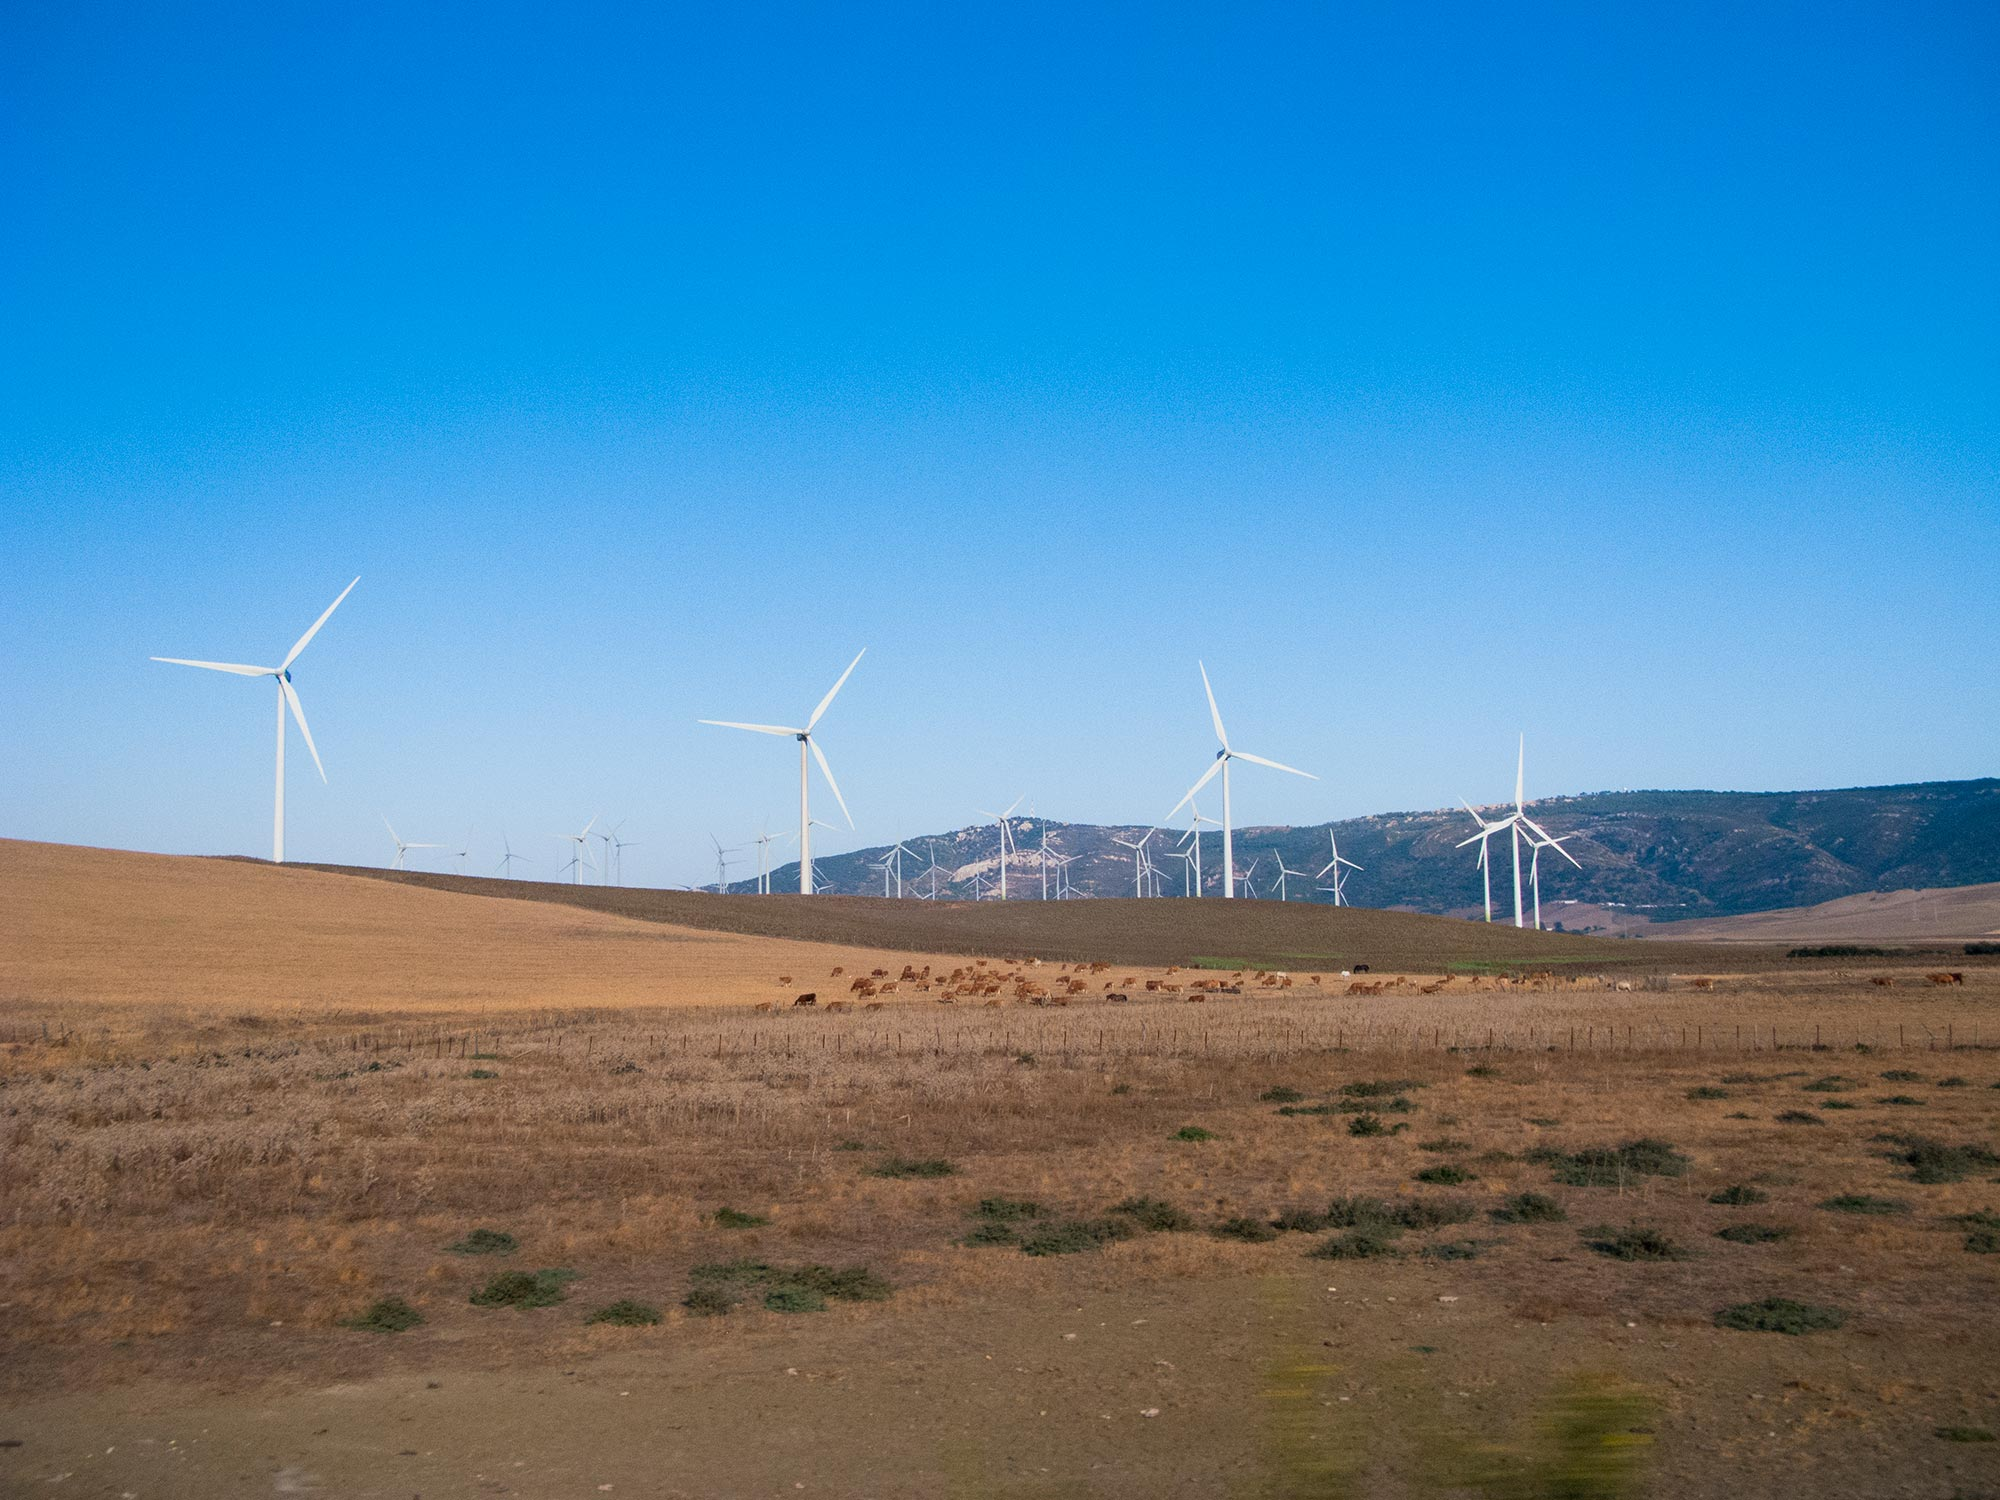 Andalusia Windmills bulls